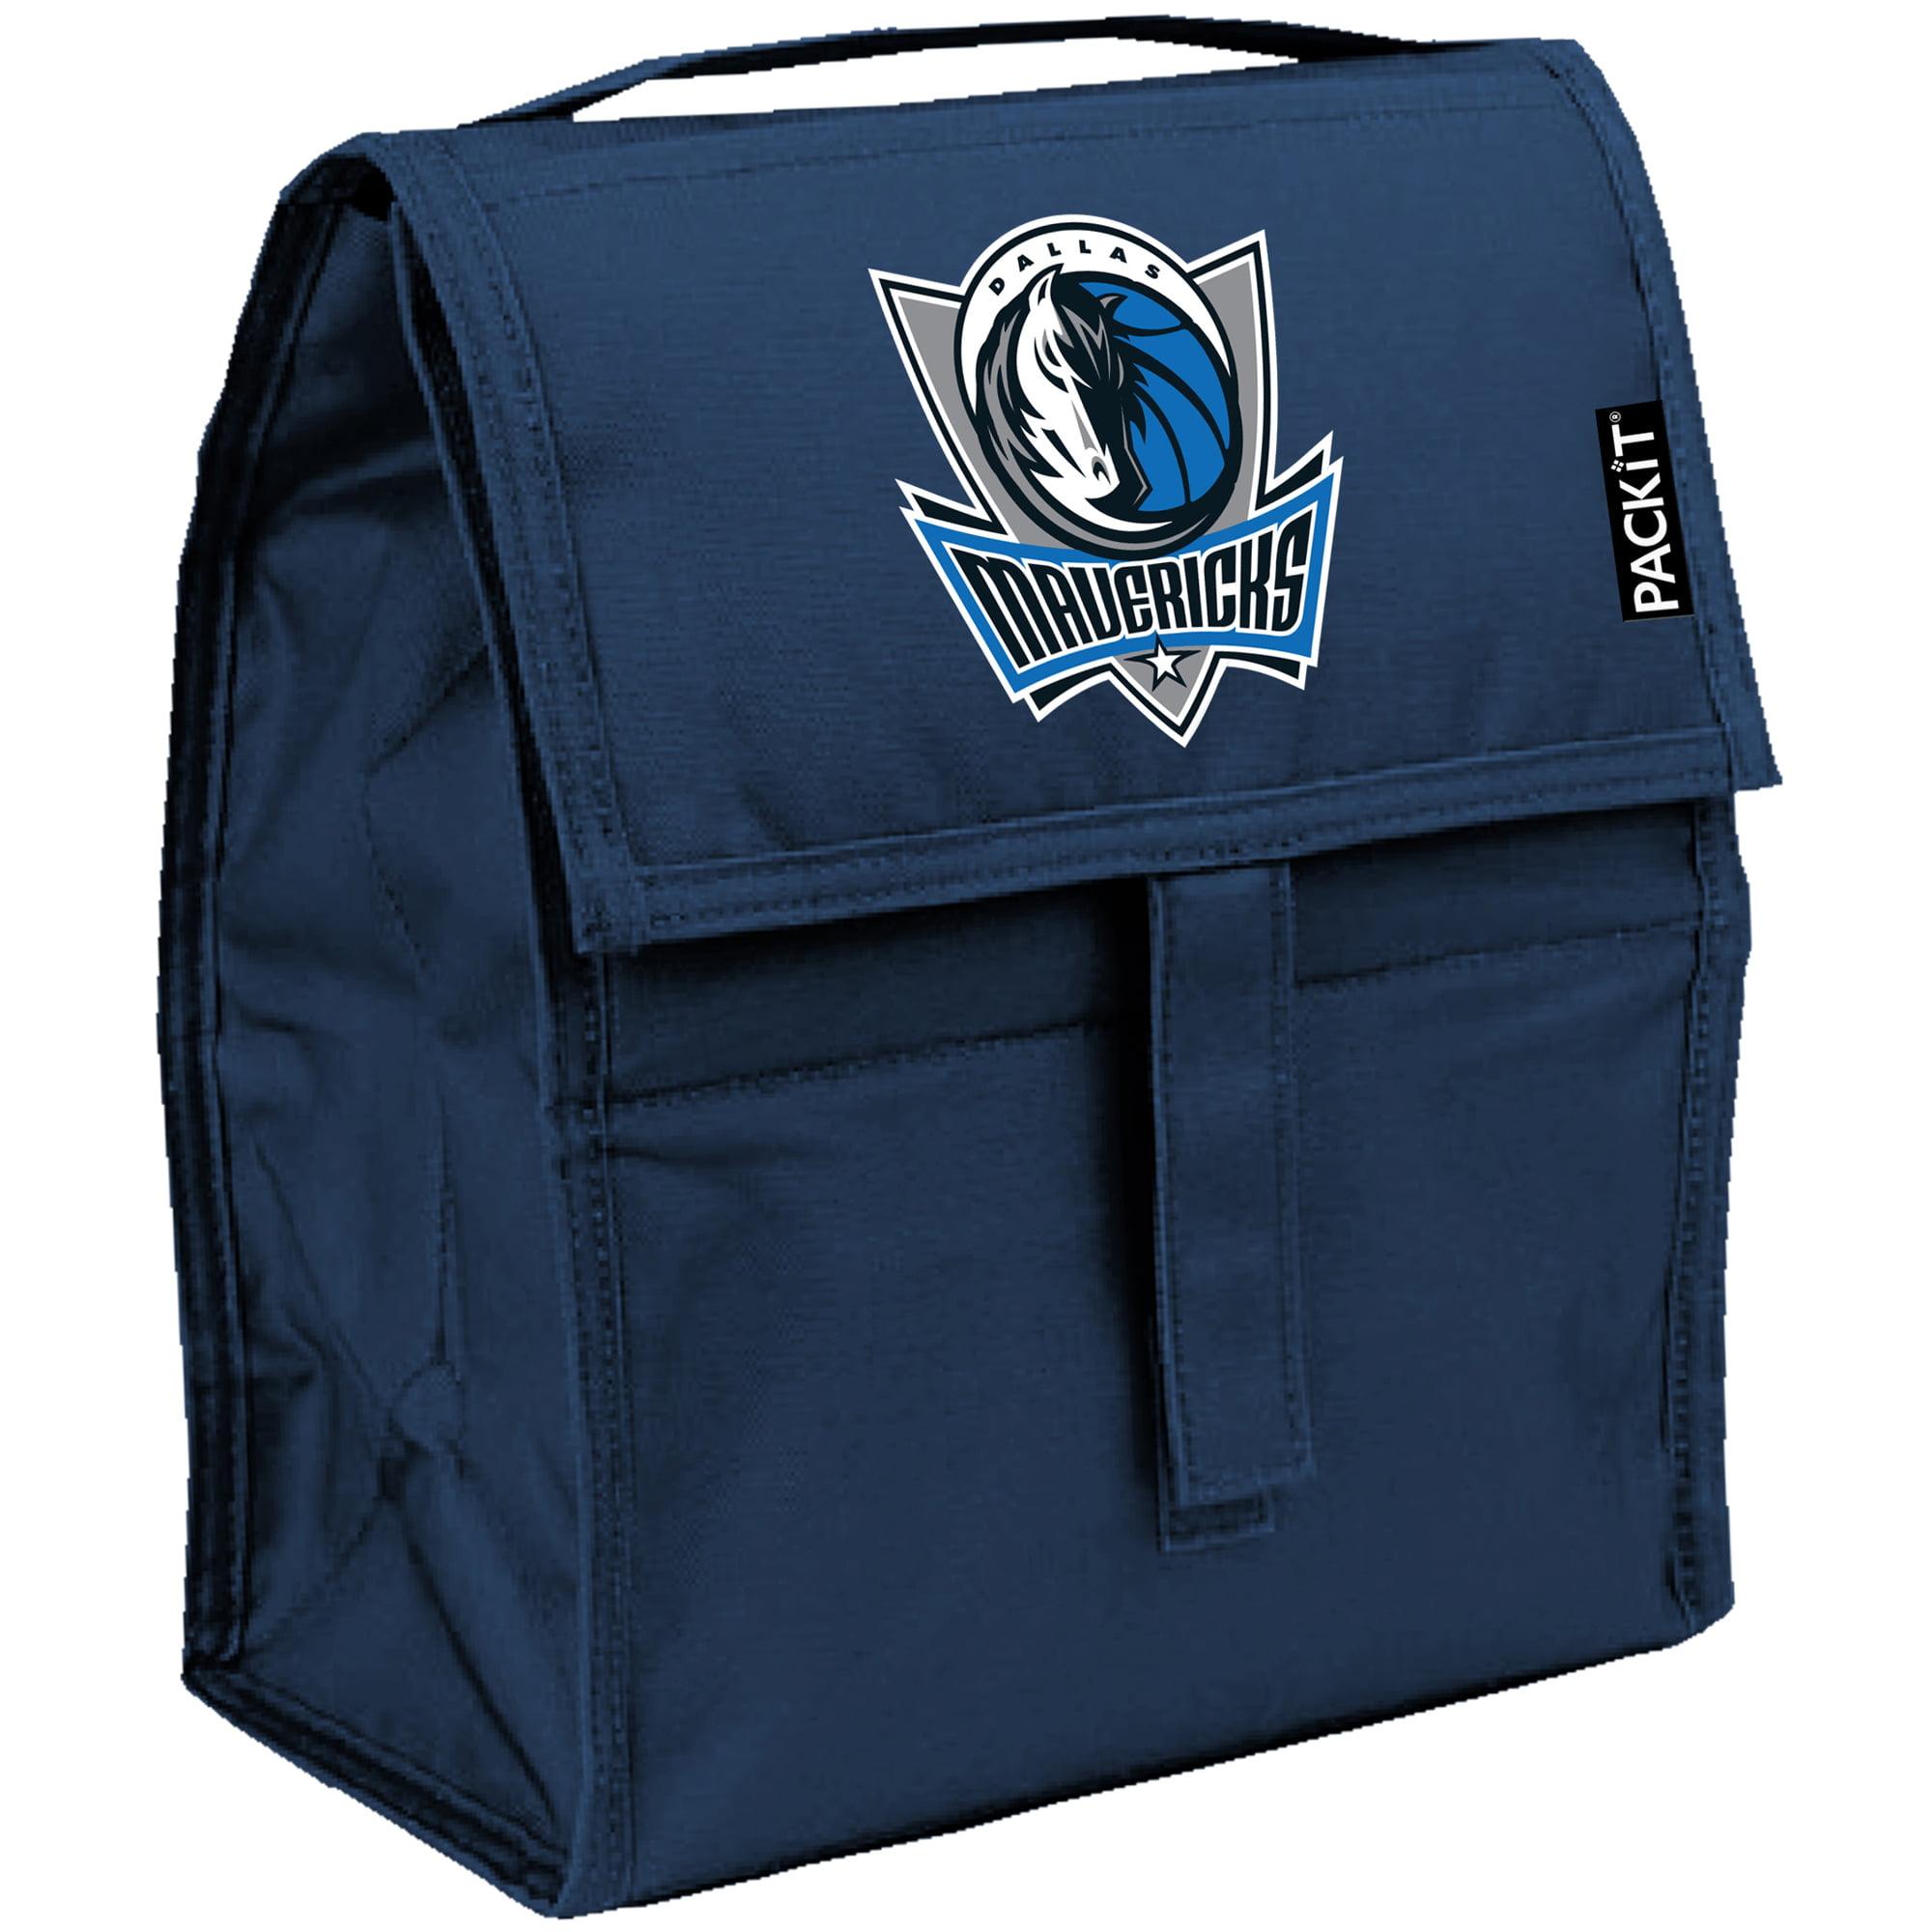 Dallas Mavericks PackIt Lunch Box - No Size